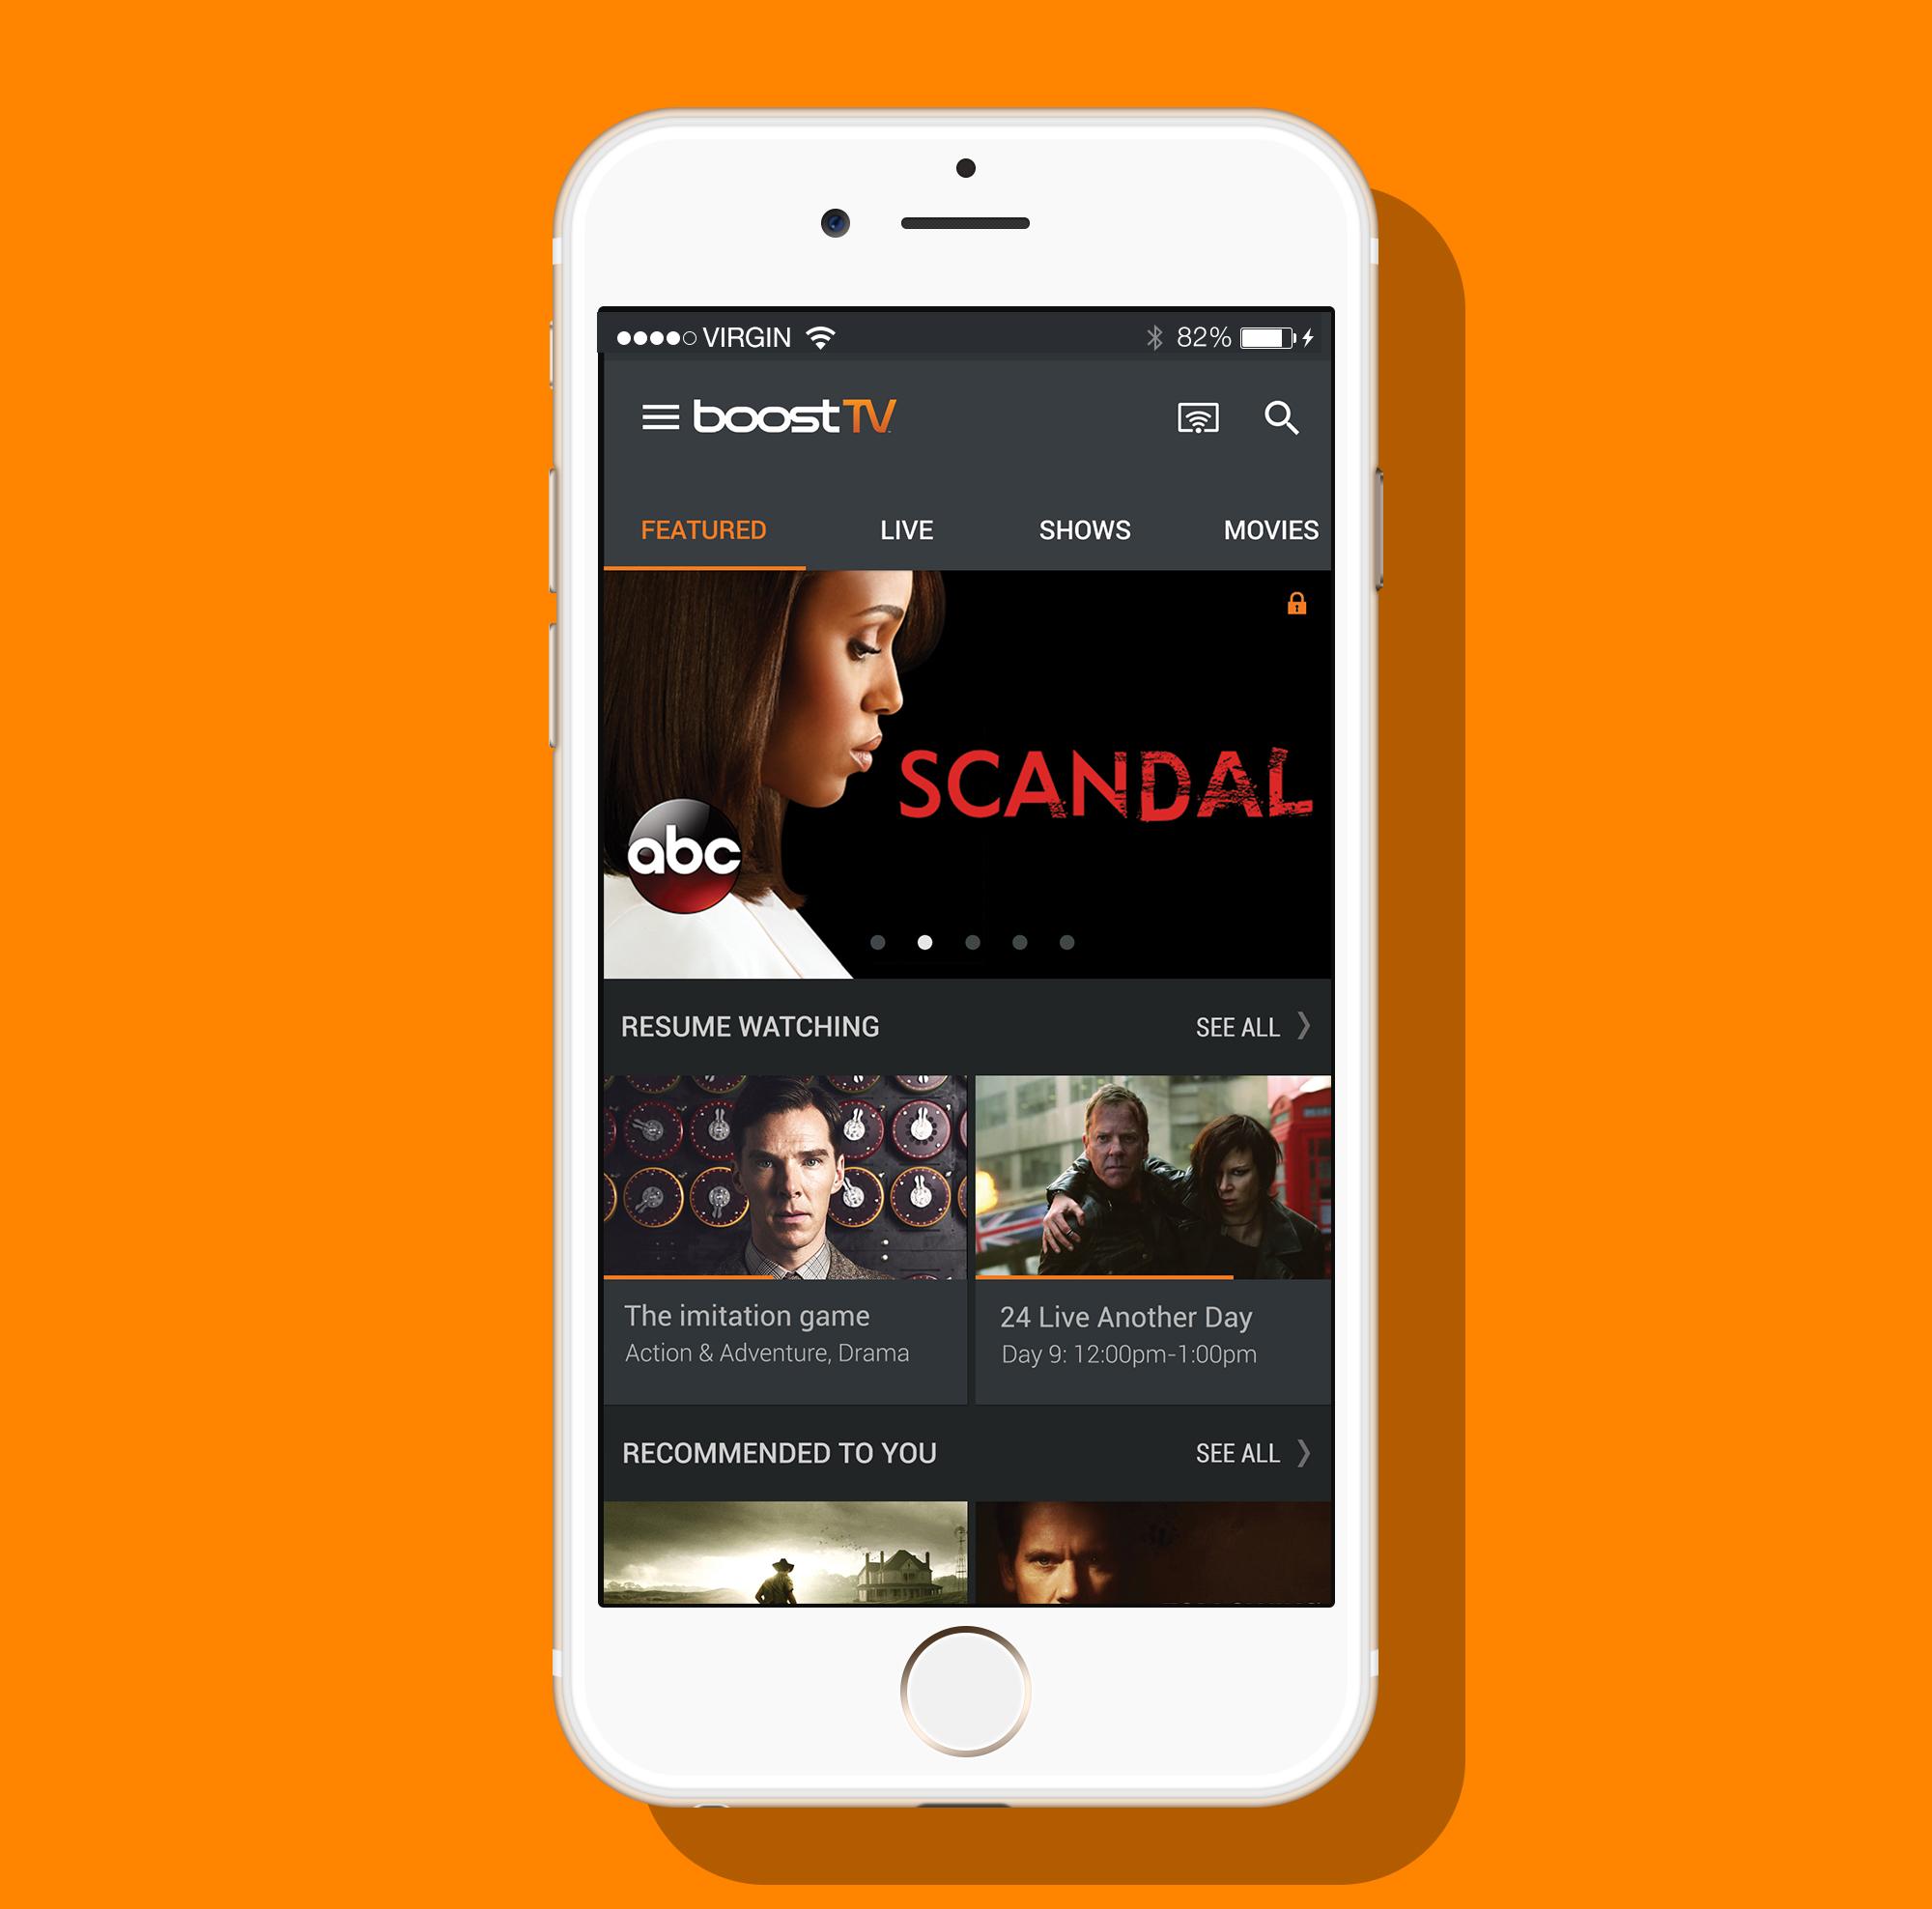 MobiTV app